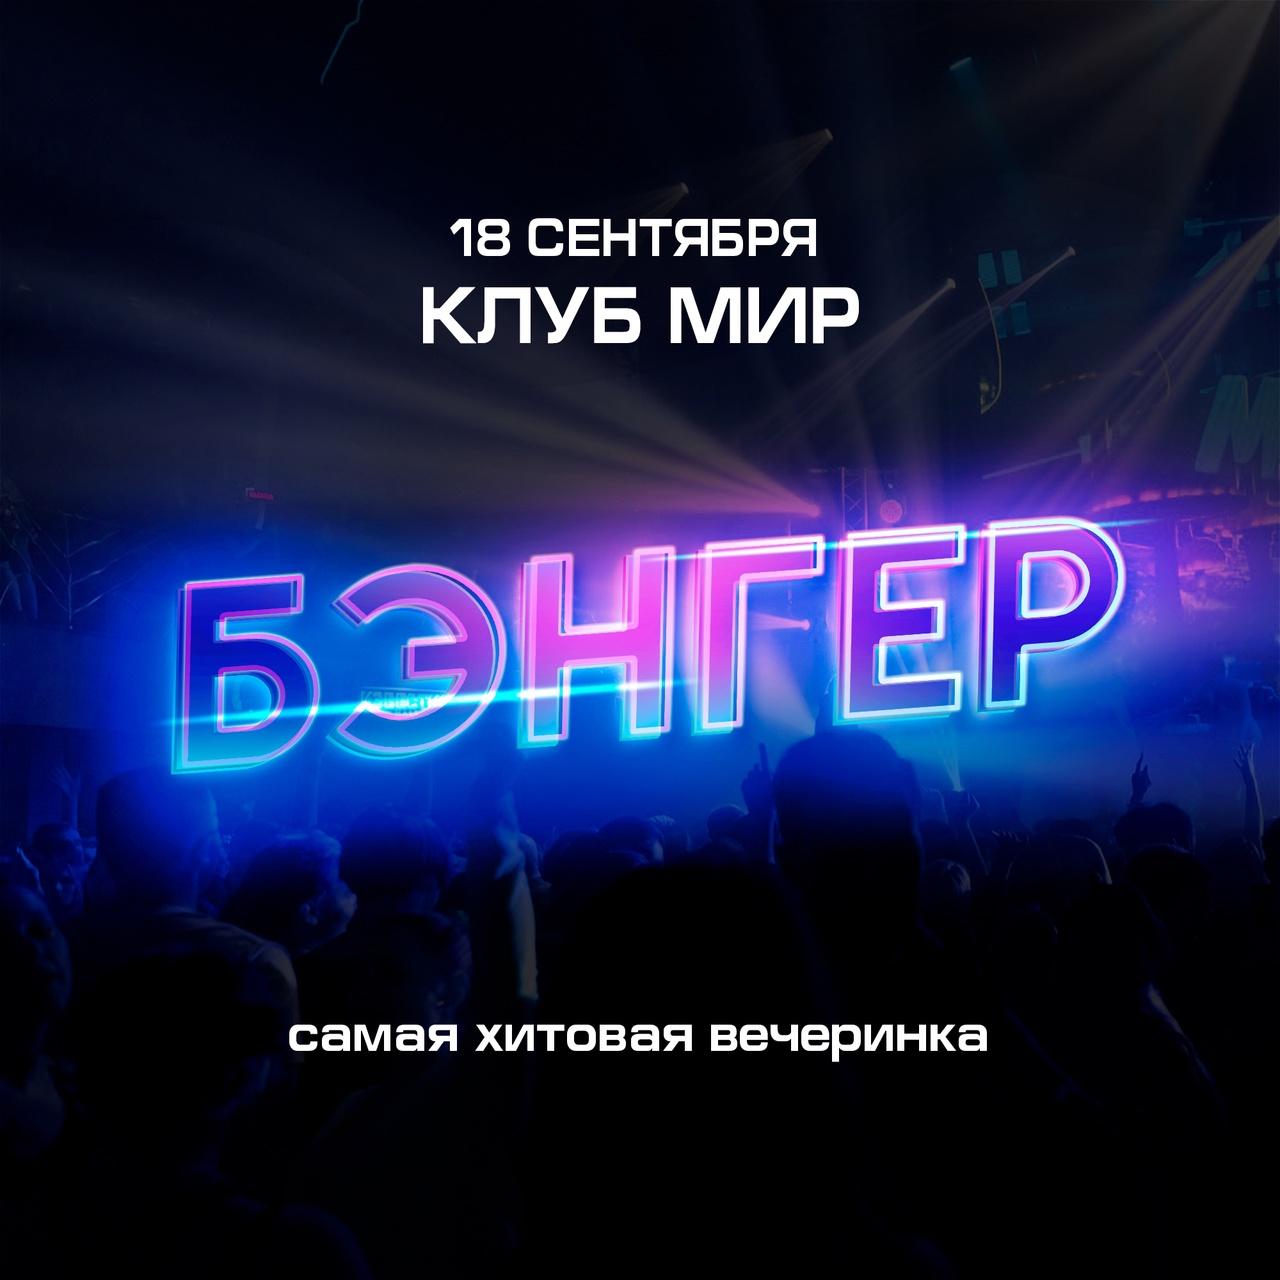 Афиша Москва БЭНГЕР / 18 сентября / Клуб МИР